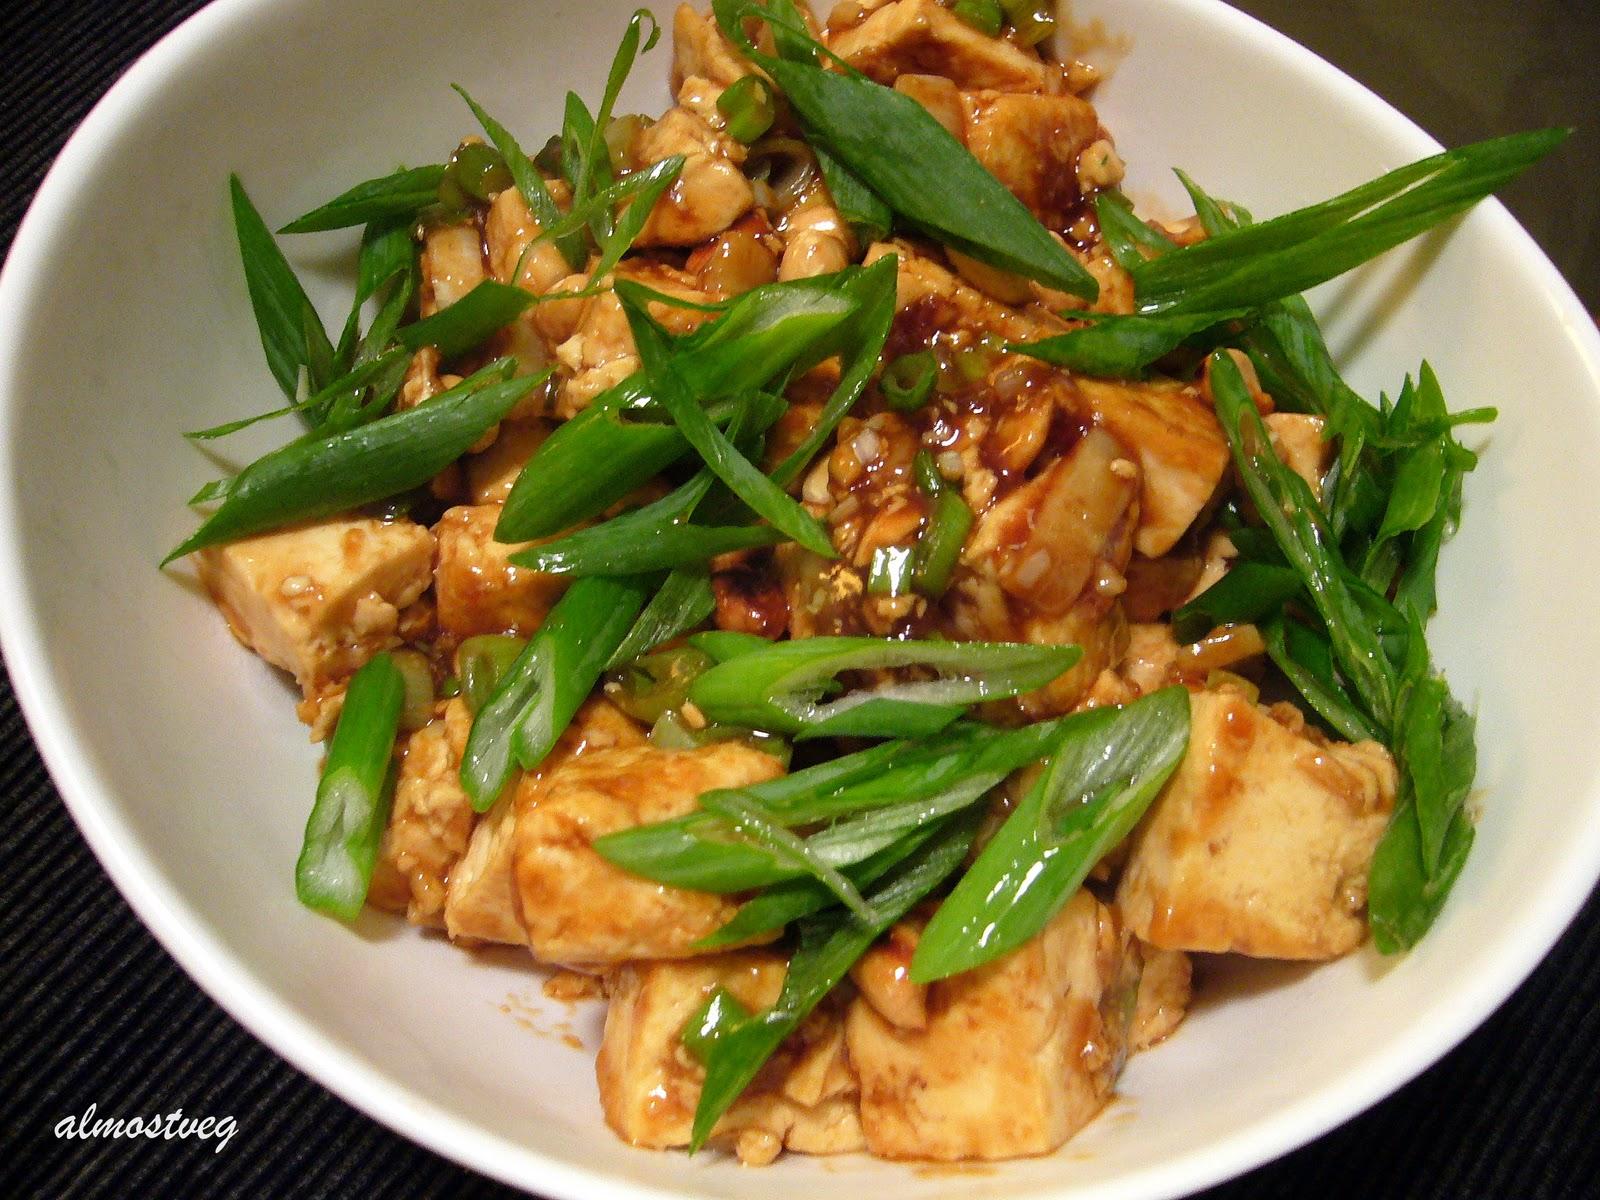 almostveg: Kung Pao tofu